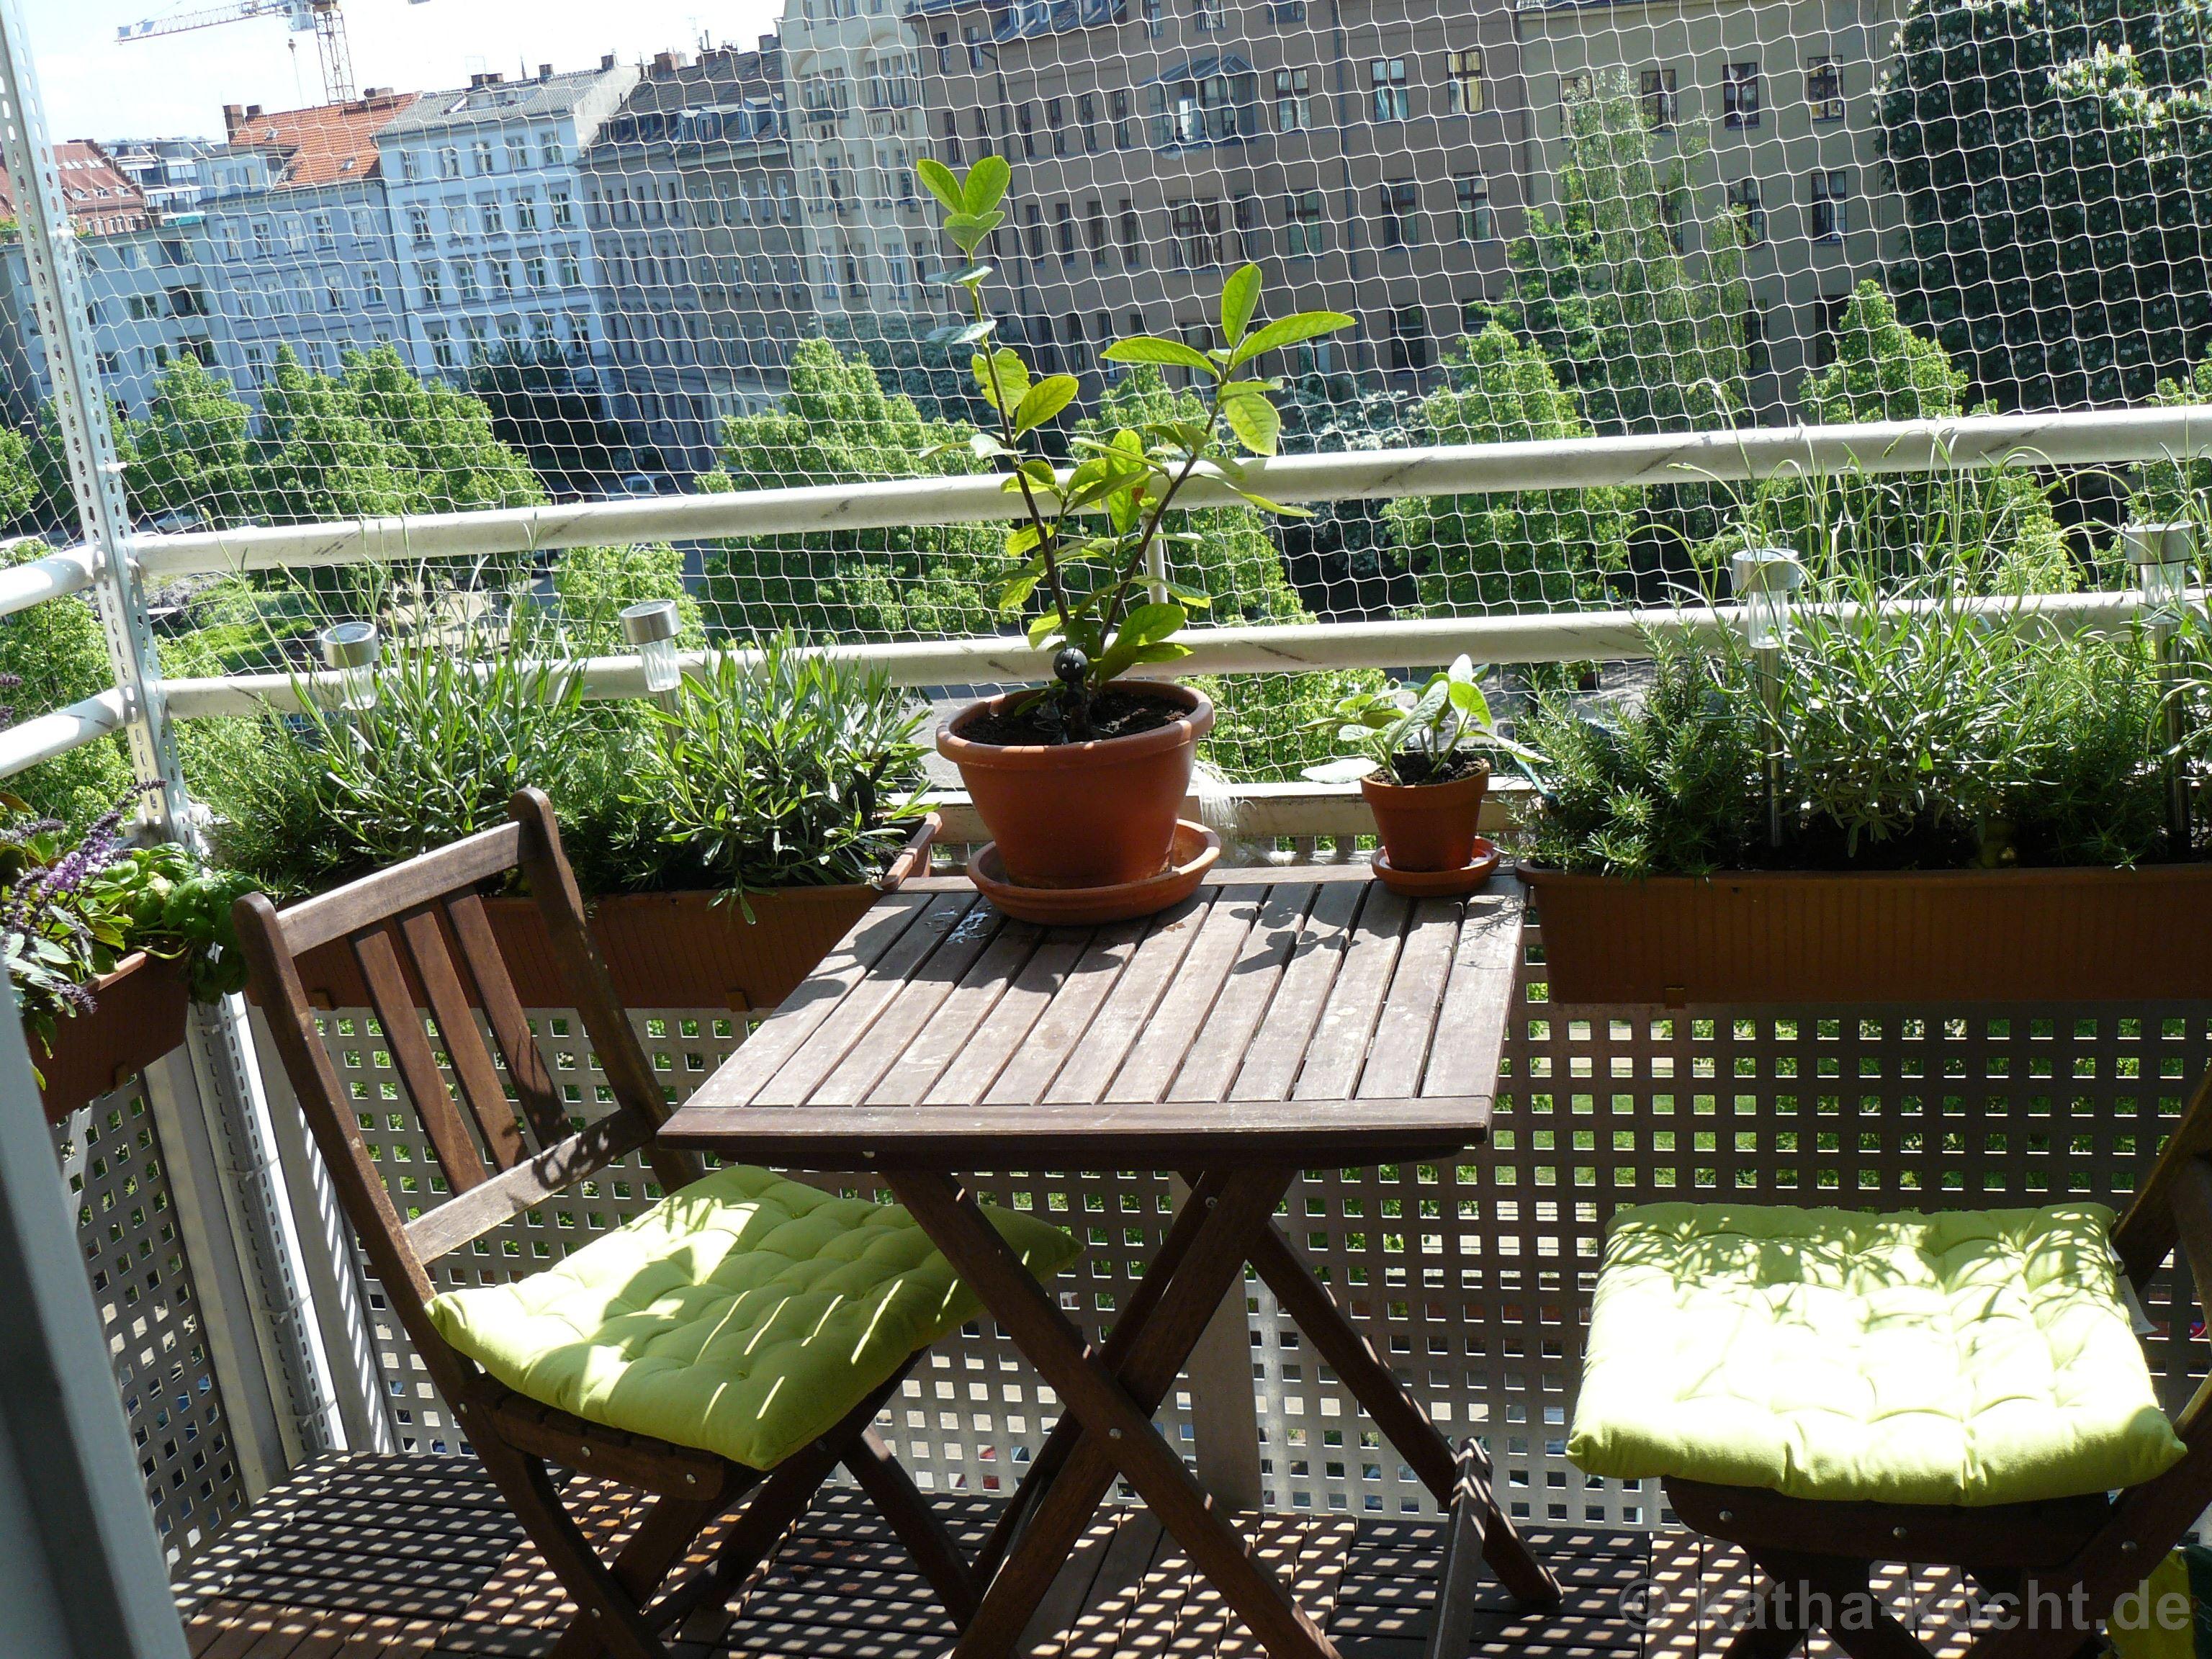 Kräutergarten auf Balkonien 2013 Katha kocht